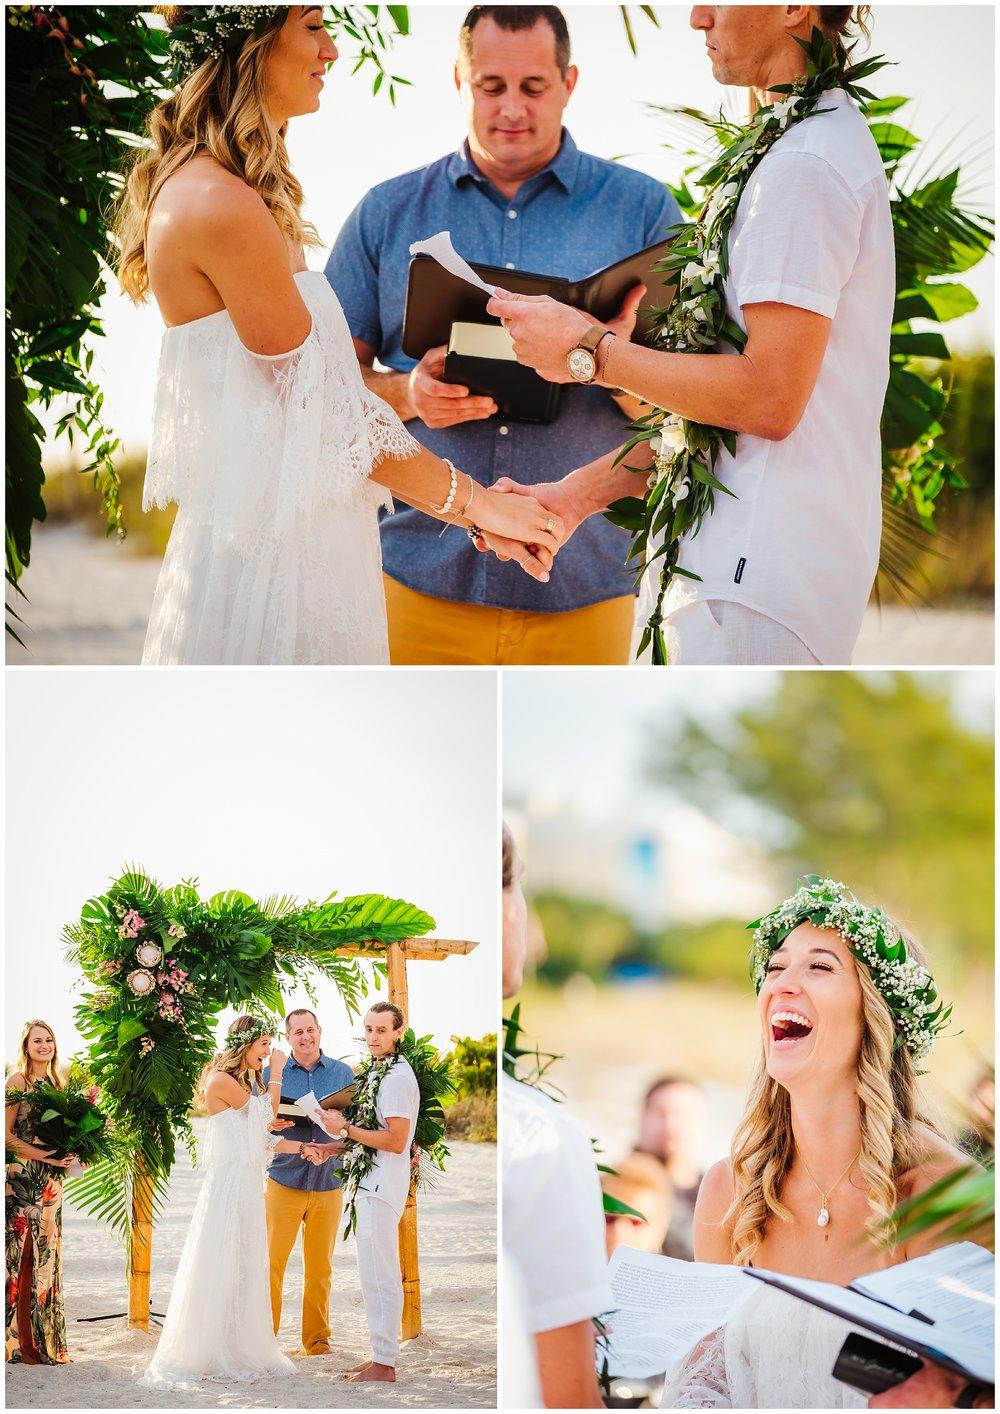 tampa-bay-wedding-photographer-barefoot-post-card-inn-tropical-hawaiin-lei-pink-pineapples-flower-crown_0172.jpg